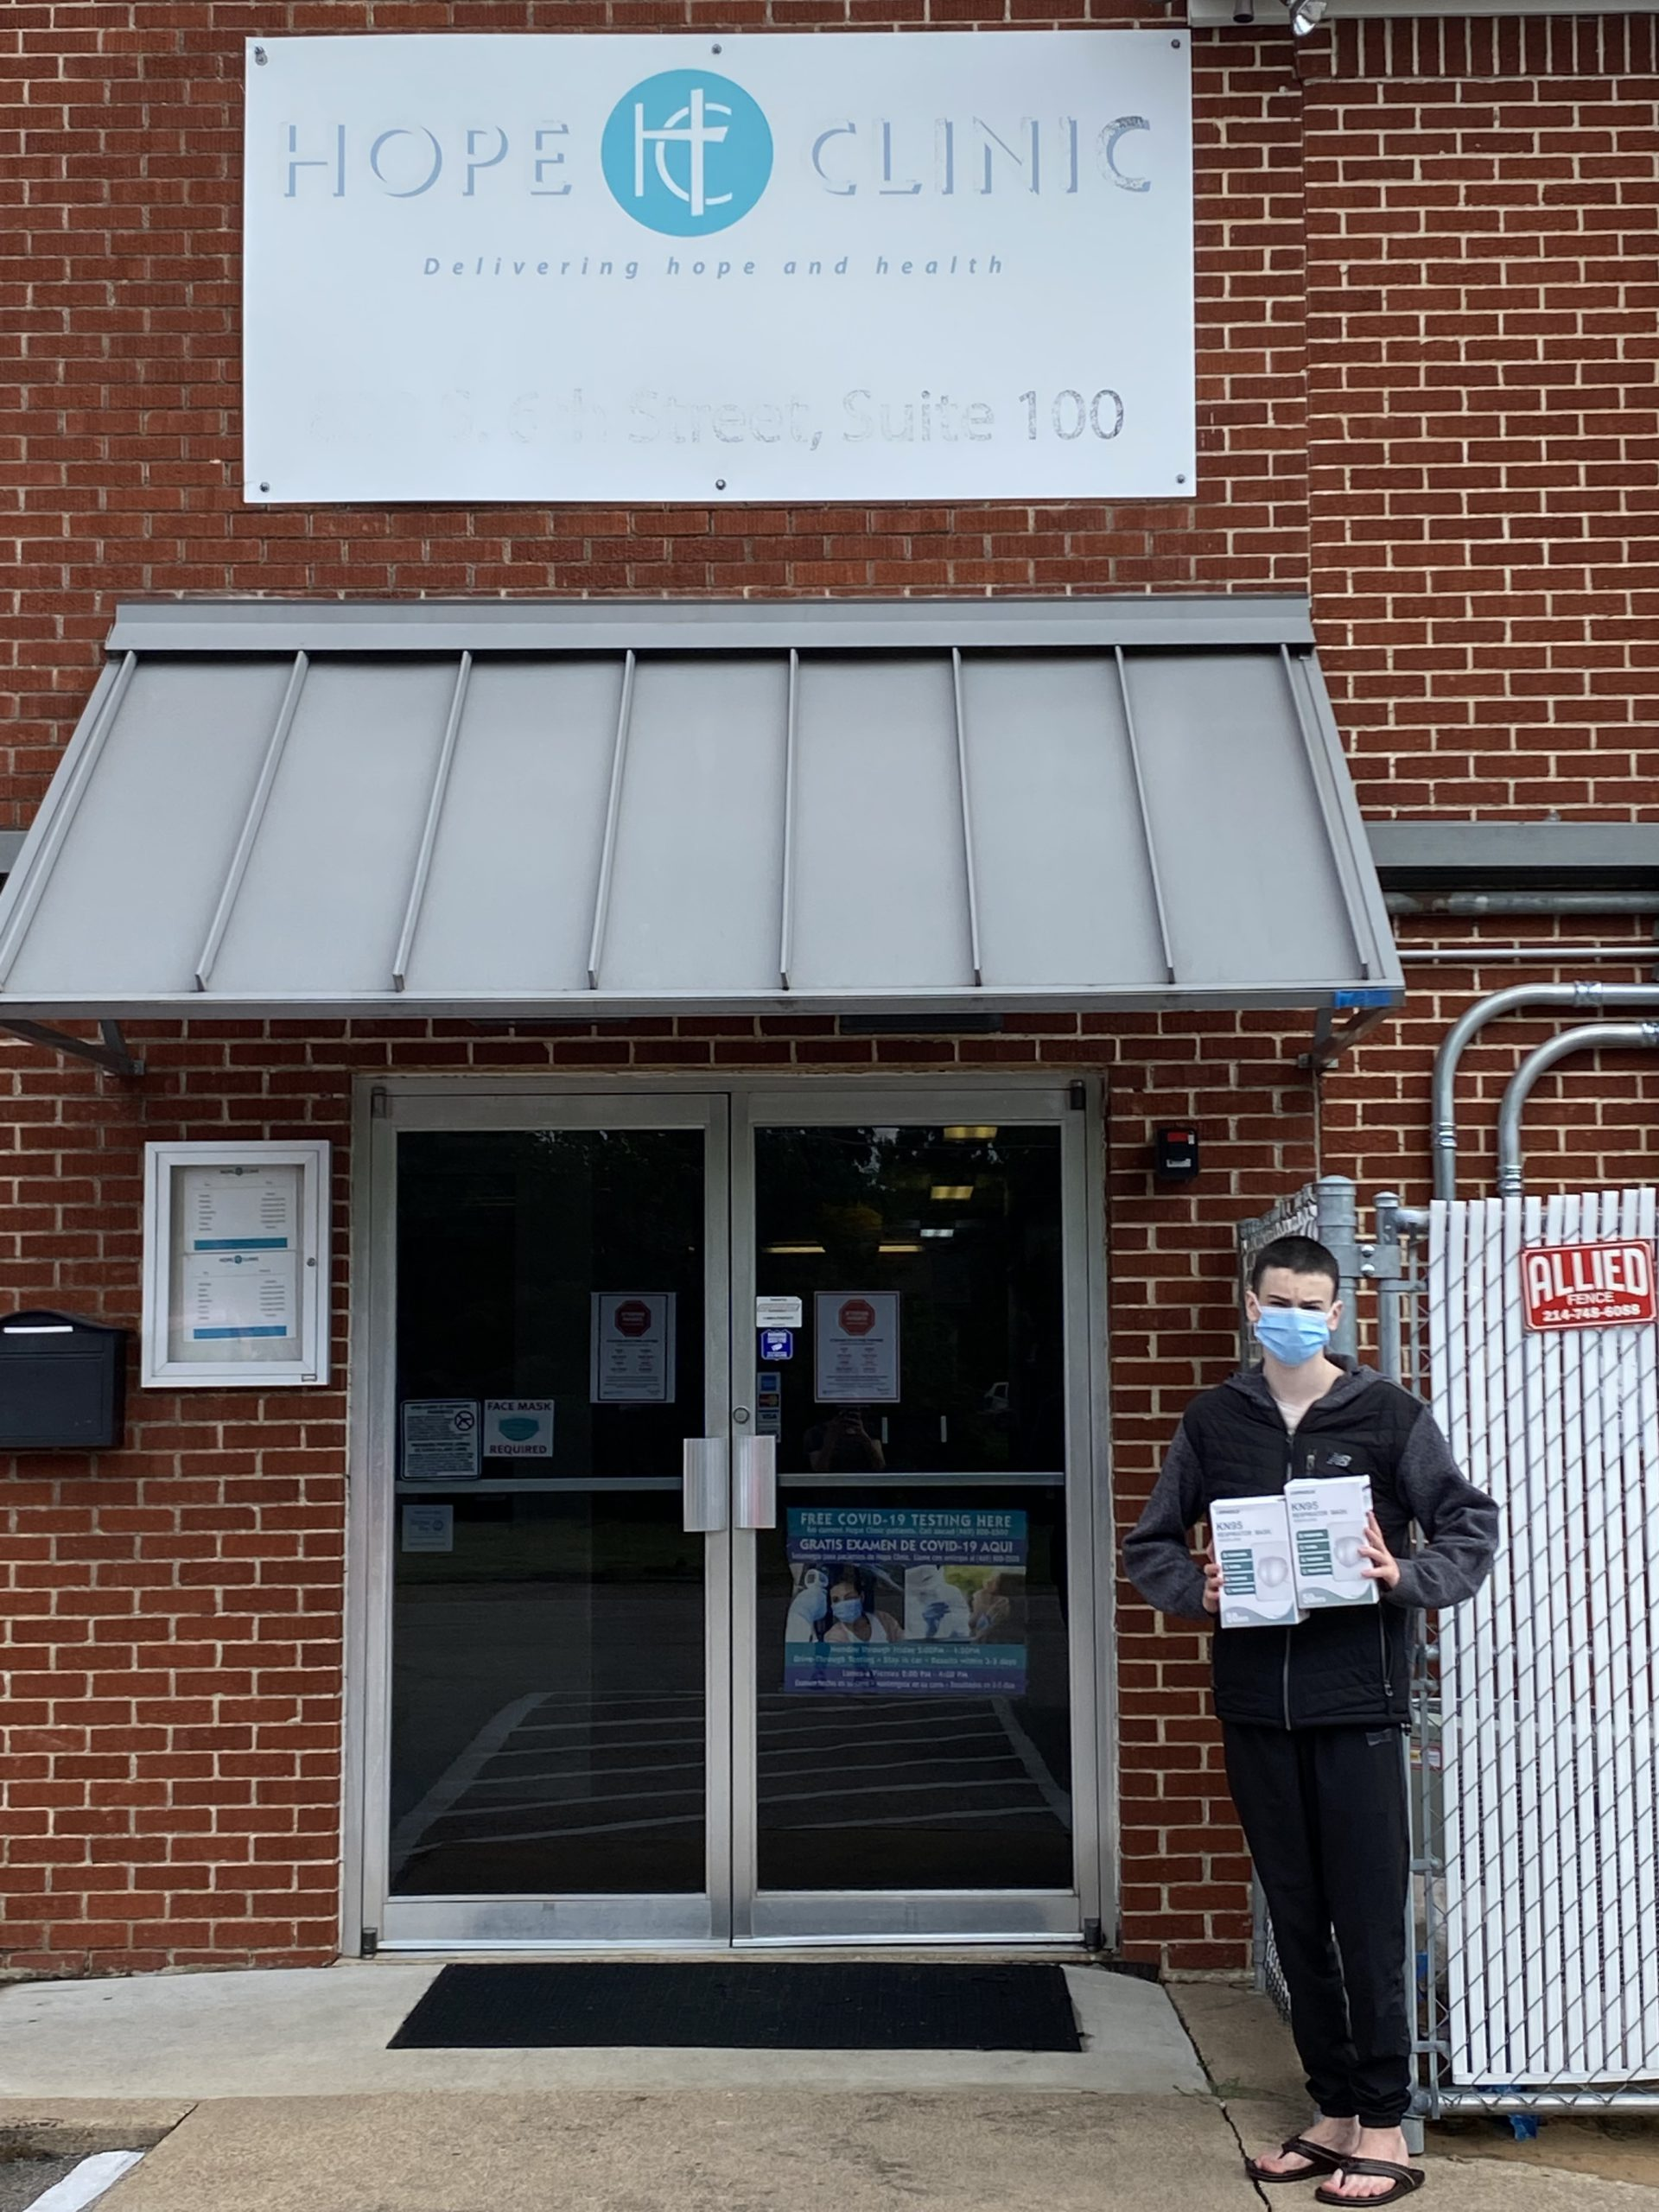 Ilan Sela Volunteer Donates M95 Medical Masks to Hope Clinic Staff in Dallas TX